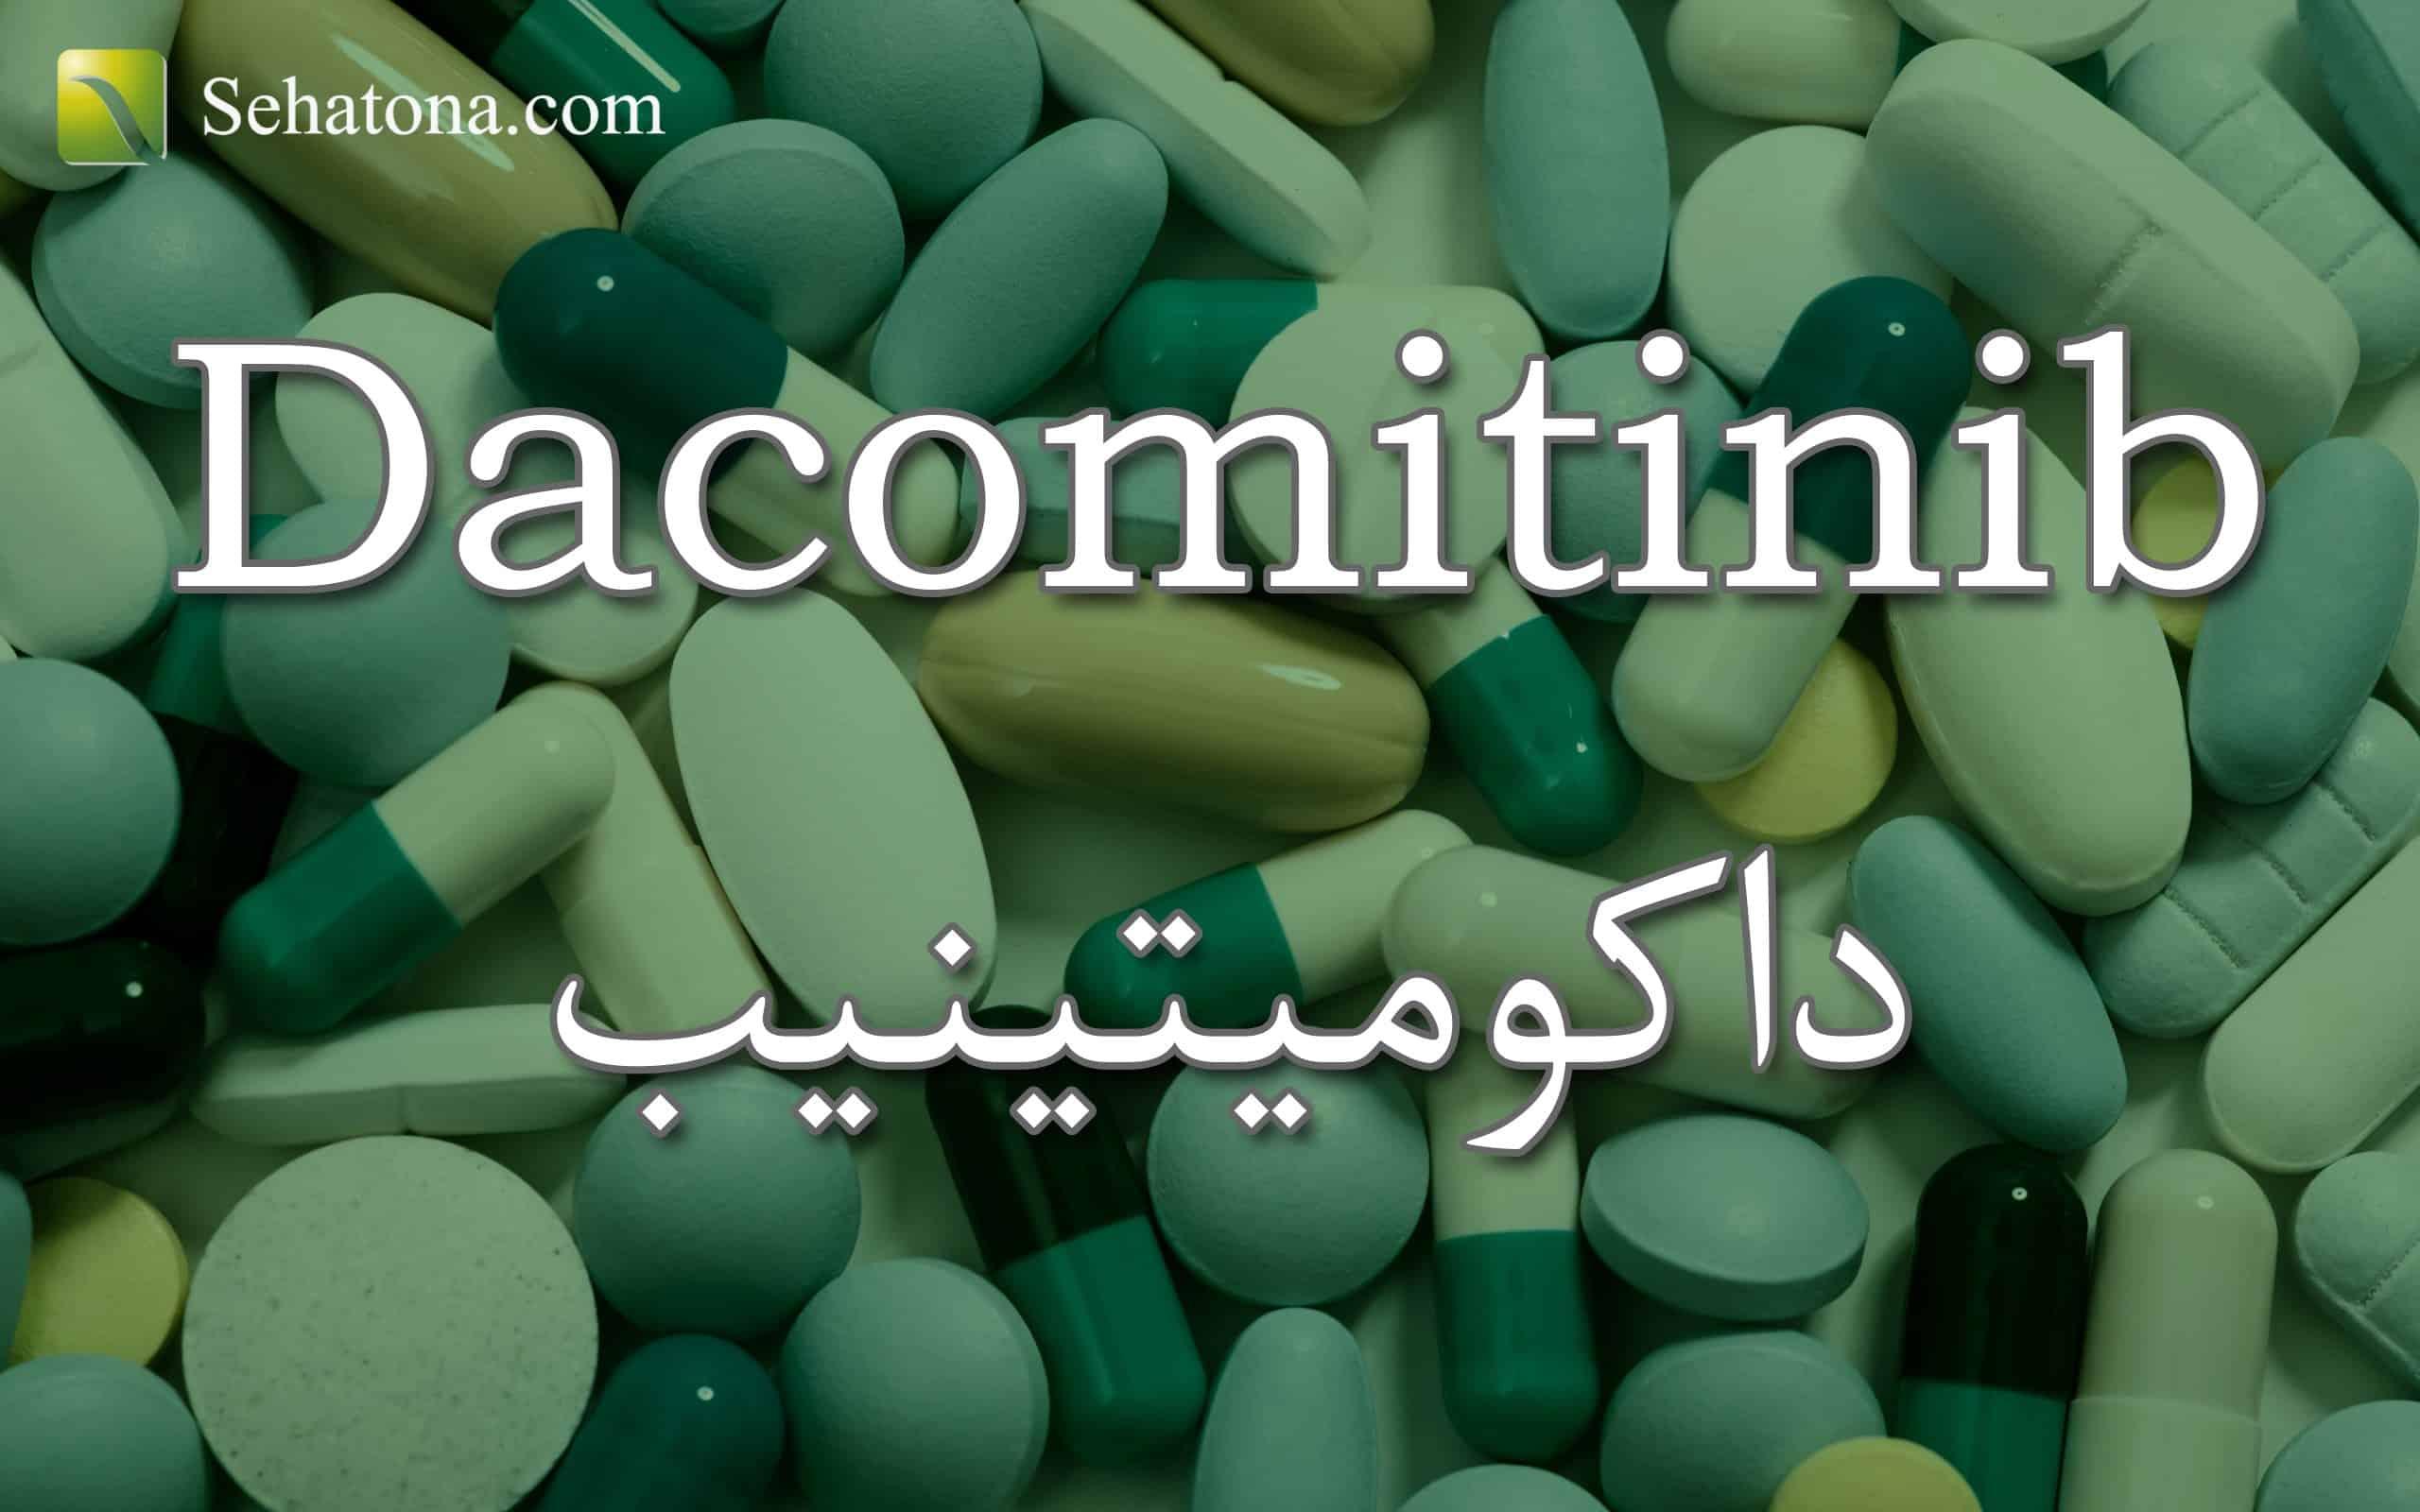 Dacomitinib